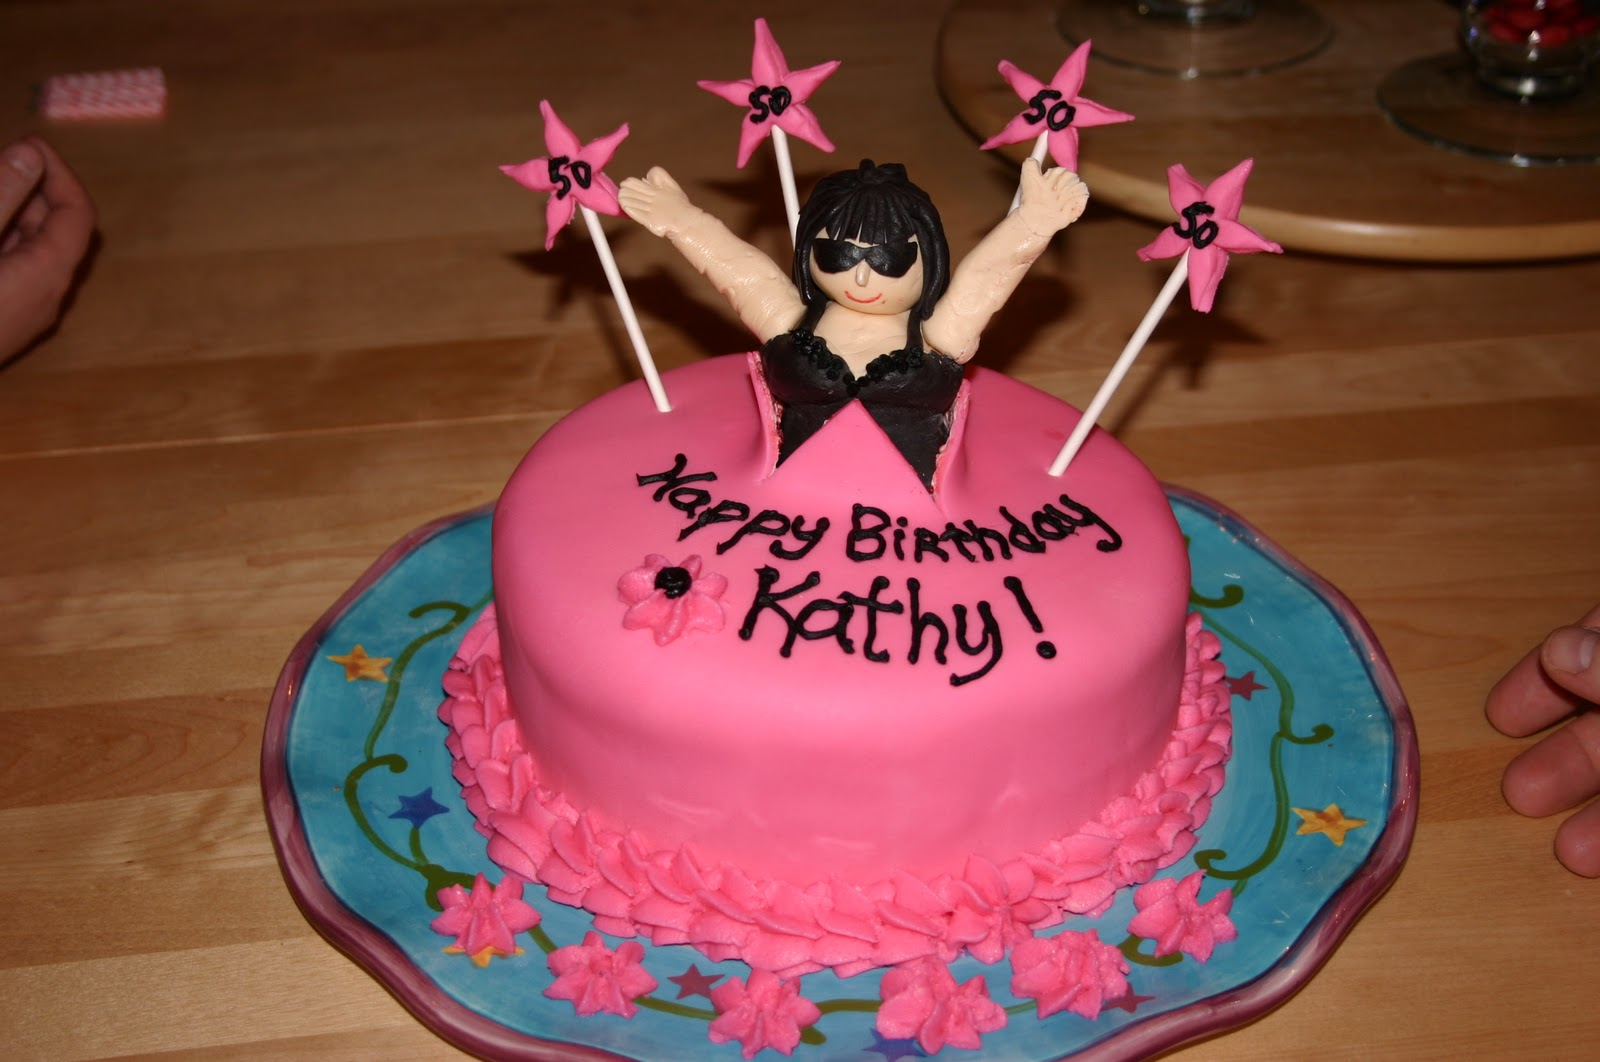 Birthday Cake For Little Sister ~ Simplysweeter: singin' the birthday blues!